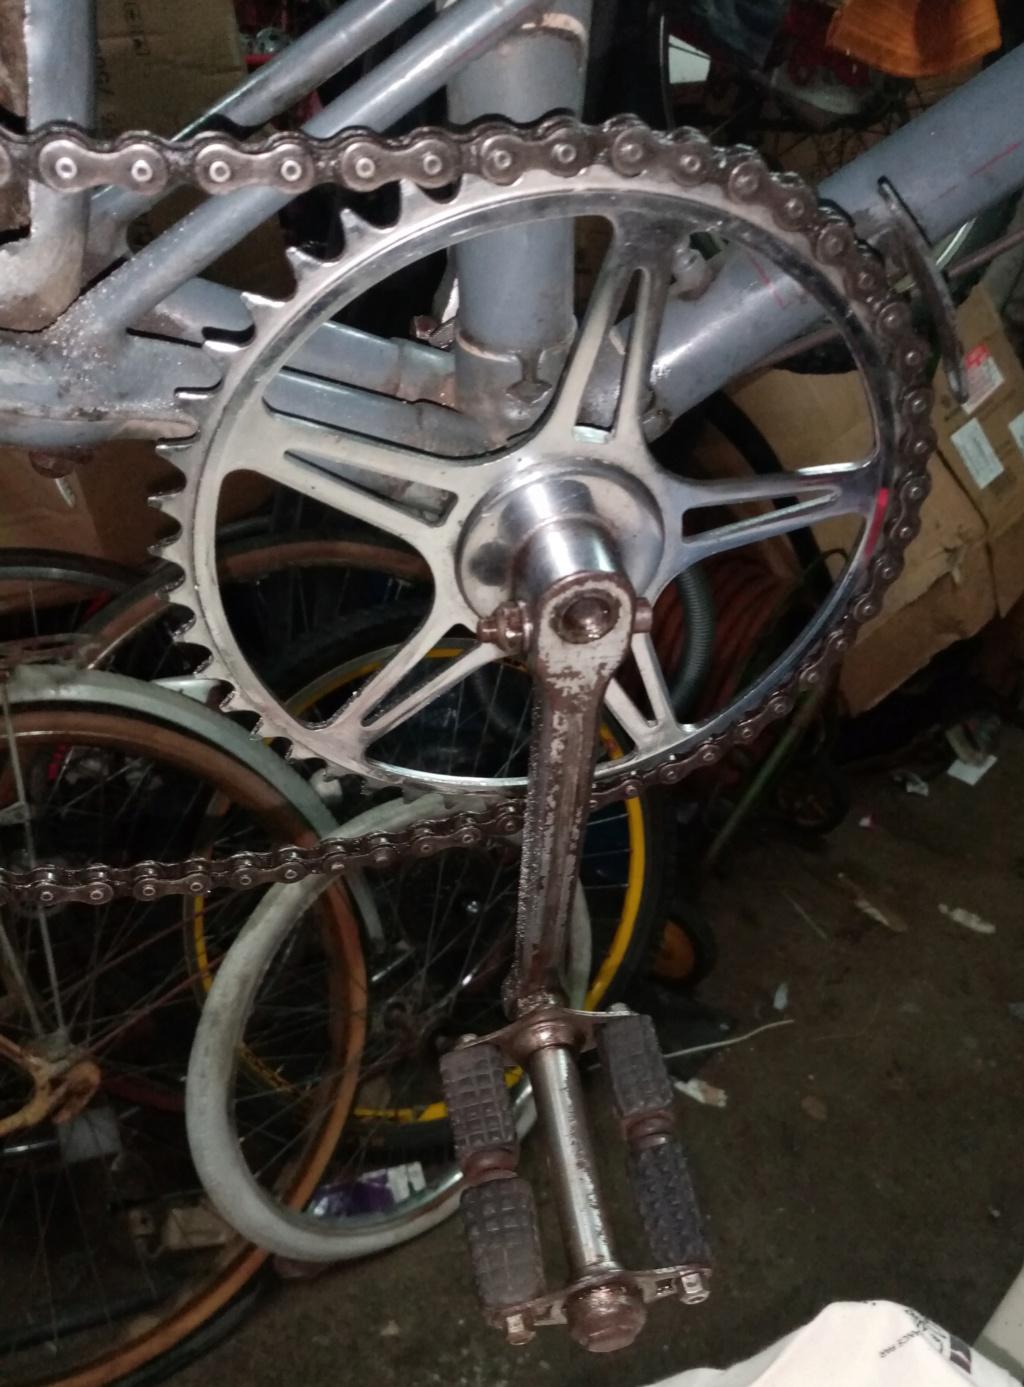 vélo mixte 1937-39 ROYAL FABRIC  3v CYCLO  01732